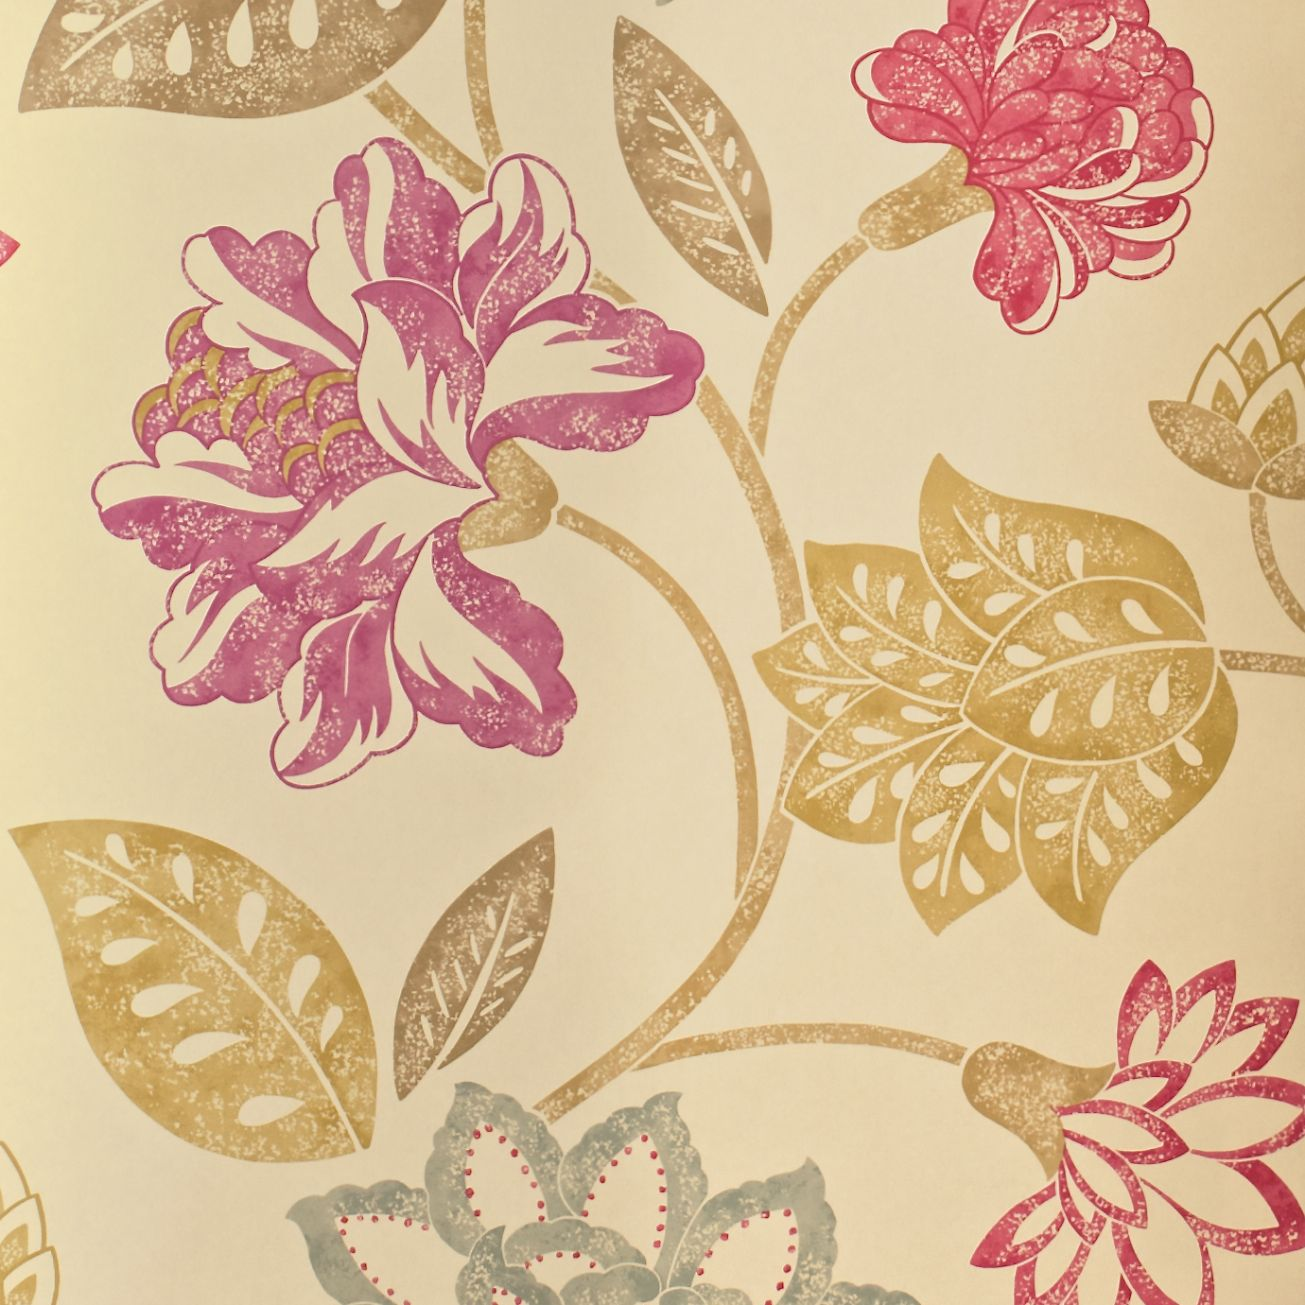 [50+] Pink and Gold Desktop Wallpaper on WallpaperSafari